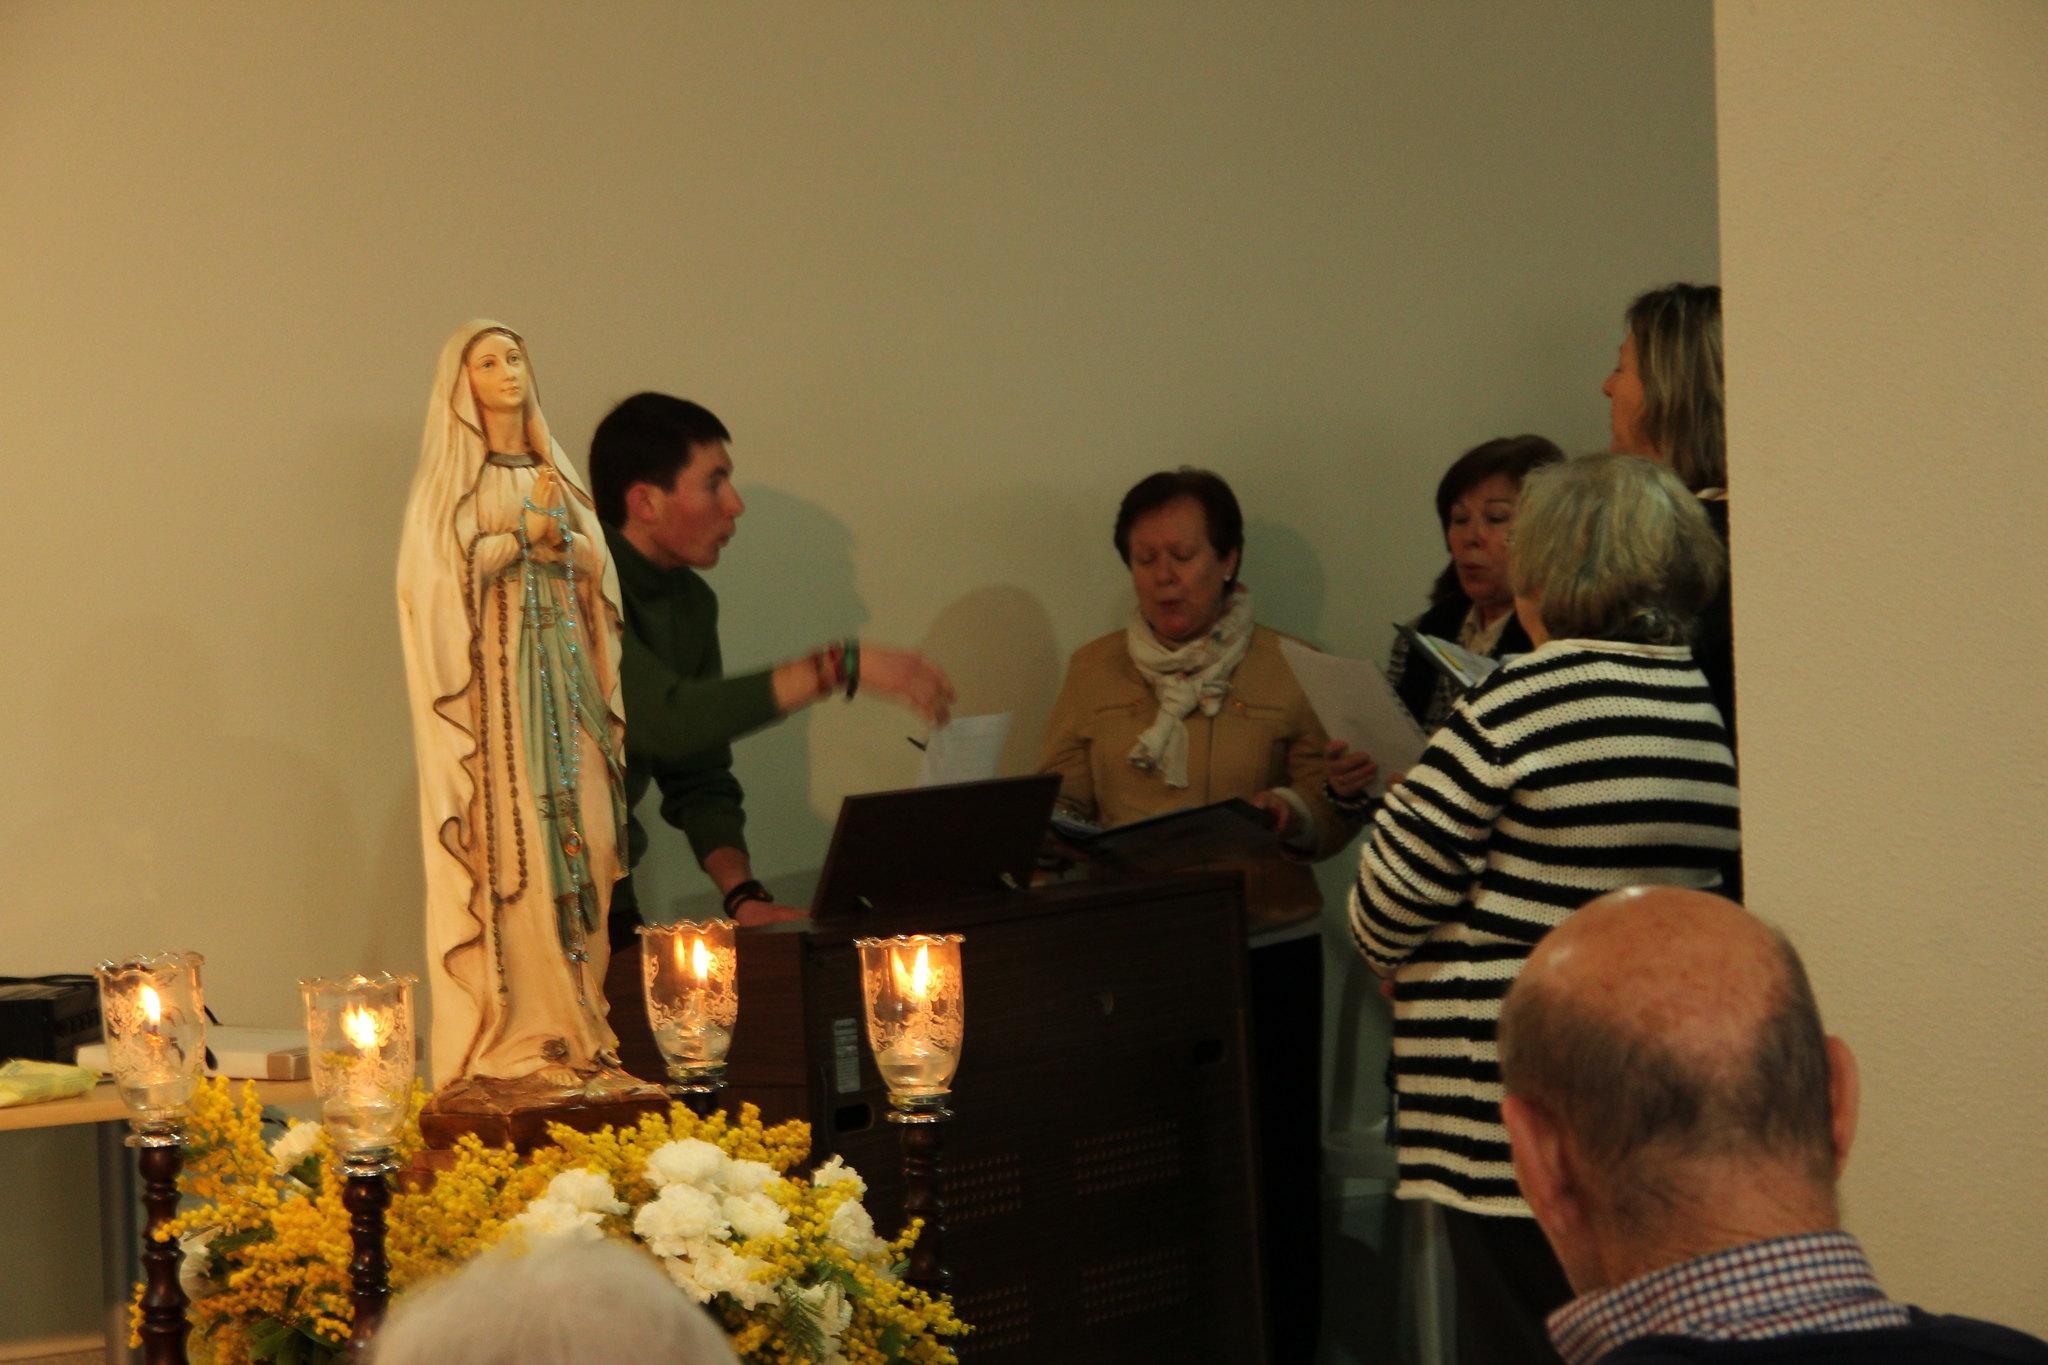 (2016-02-13) - Inauguración Virgen De Lourdes, La Molineta - Archivo La Molineta (007)